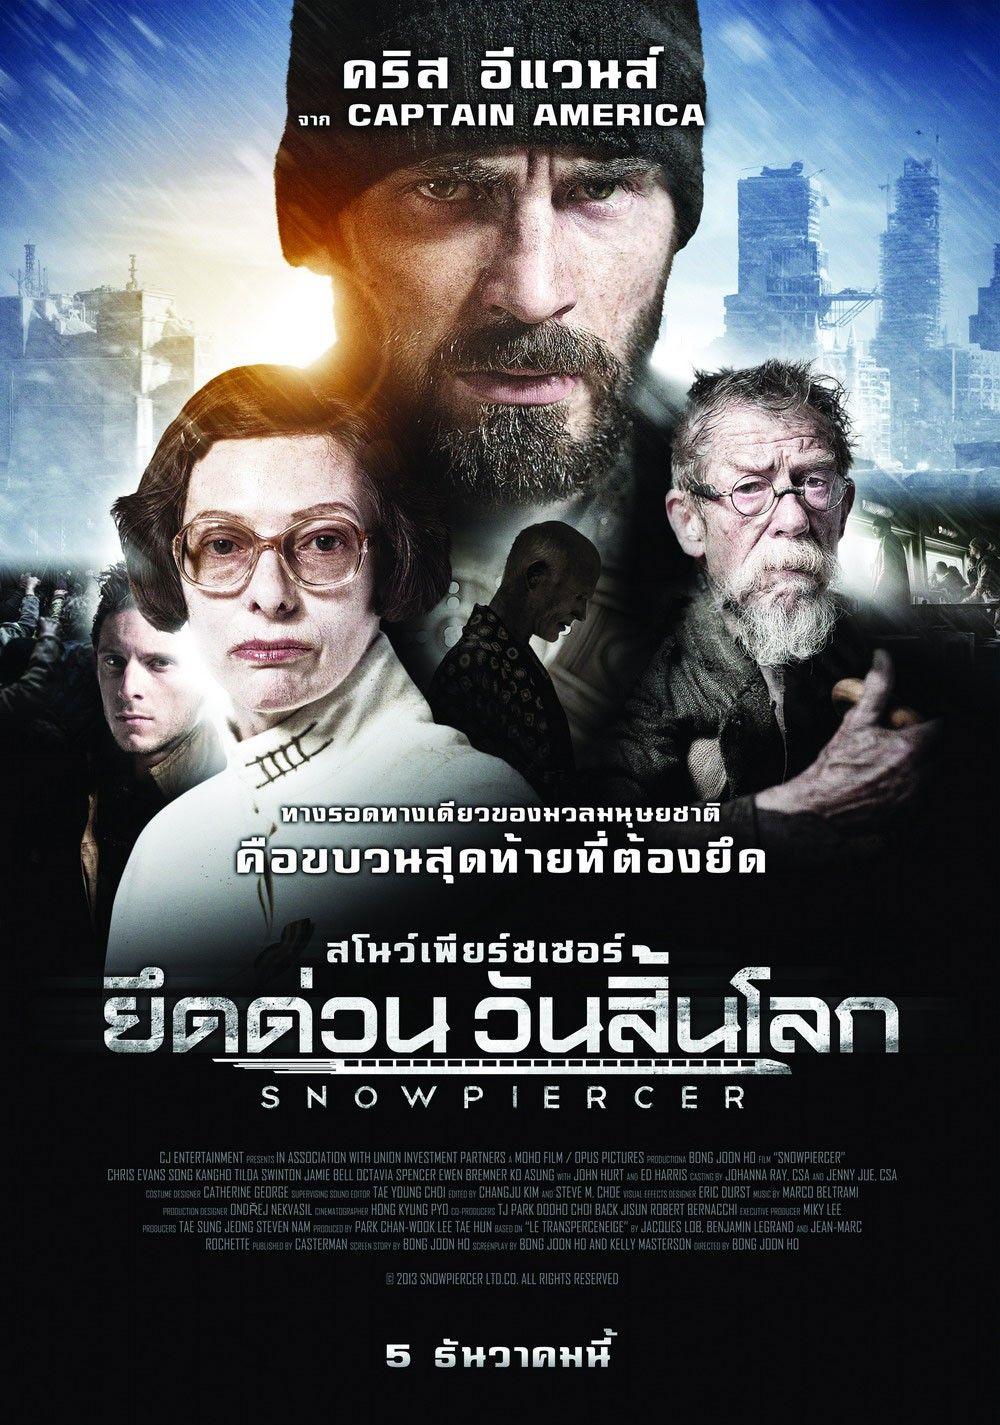 Snowpiercer Movie posters, Tv series online, Free movies